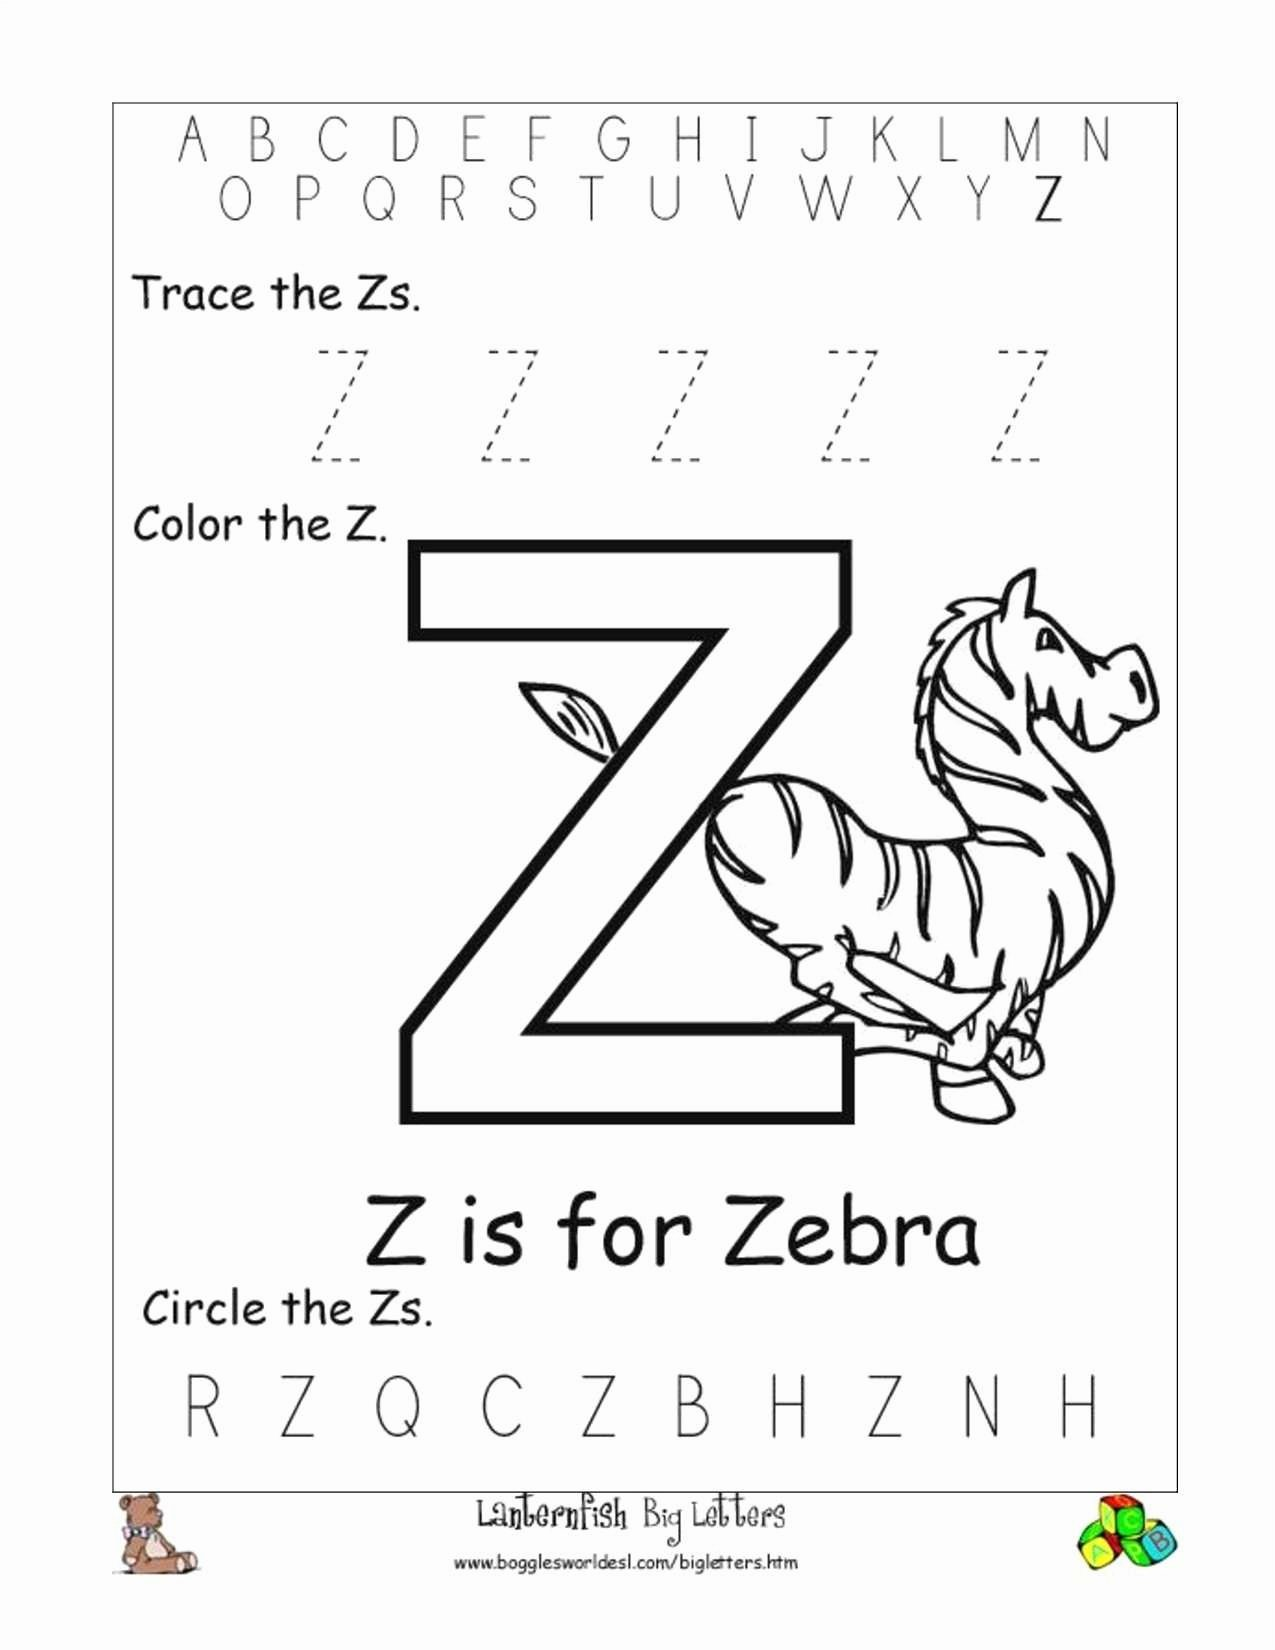 Worksheets for Preschoolers Letters top Worksheets Preschool Worksheet Alphabet to Free Tracing